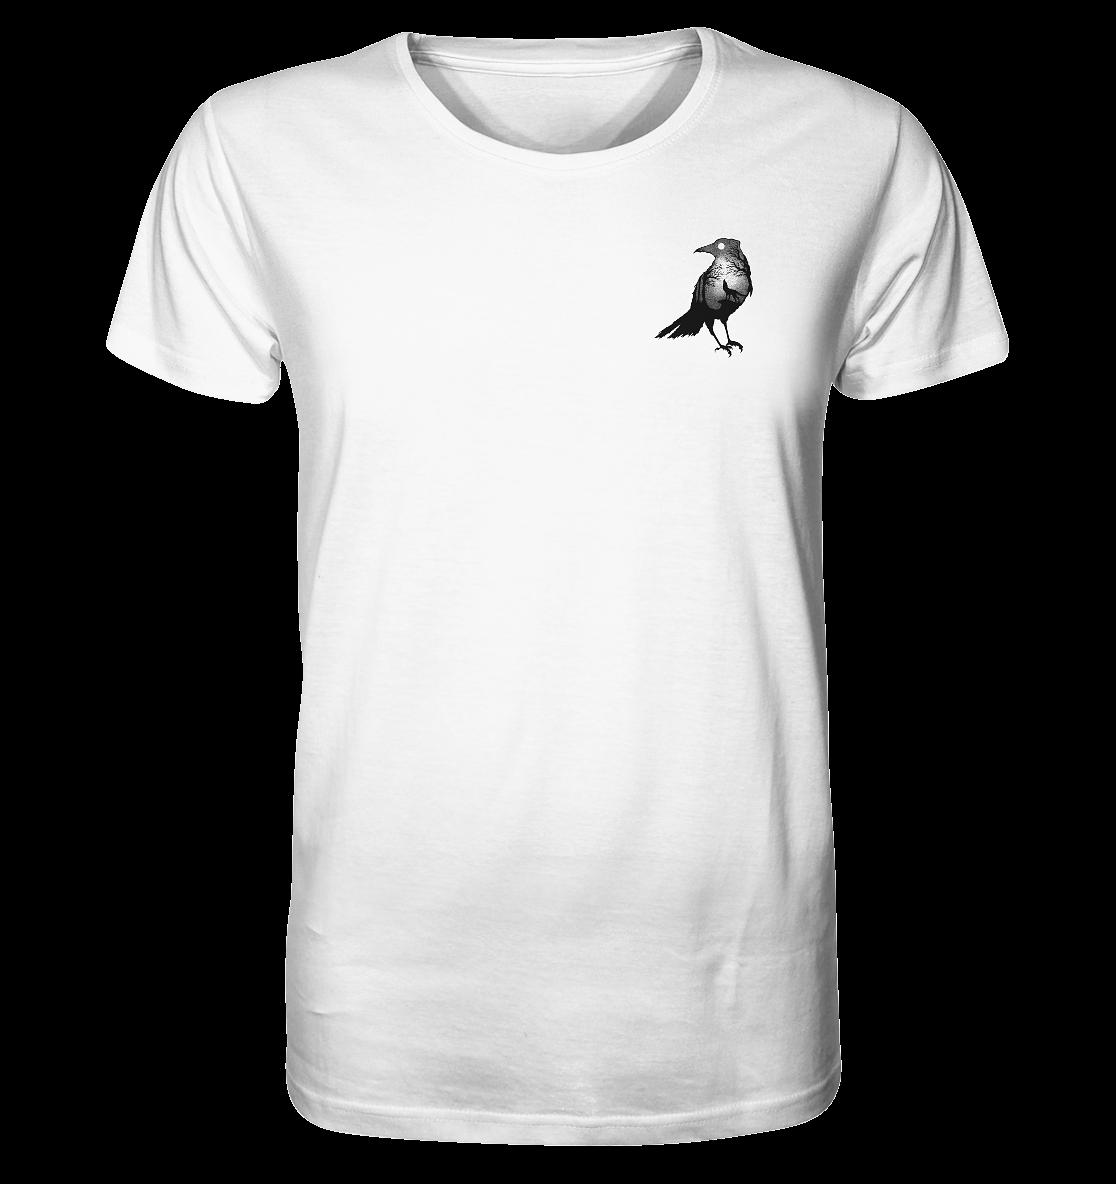 front-organic-shirt-f8f8f8-1116x-5.png